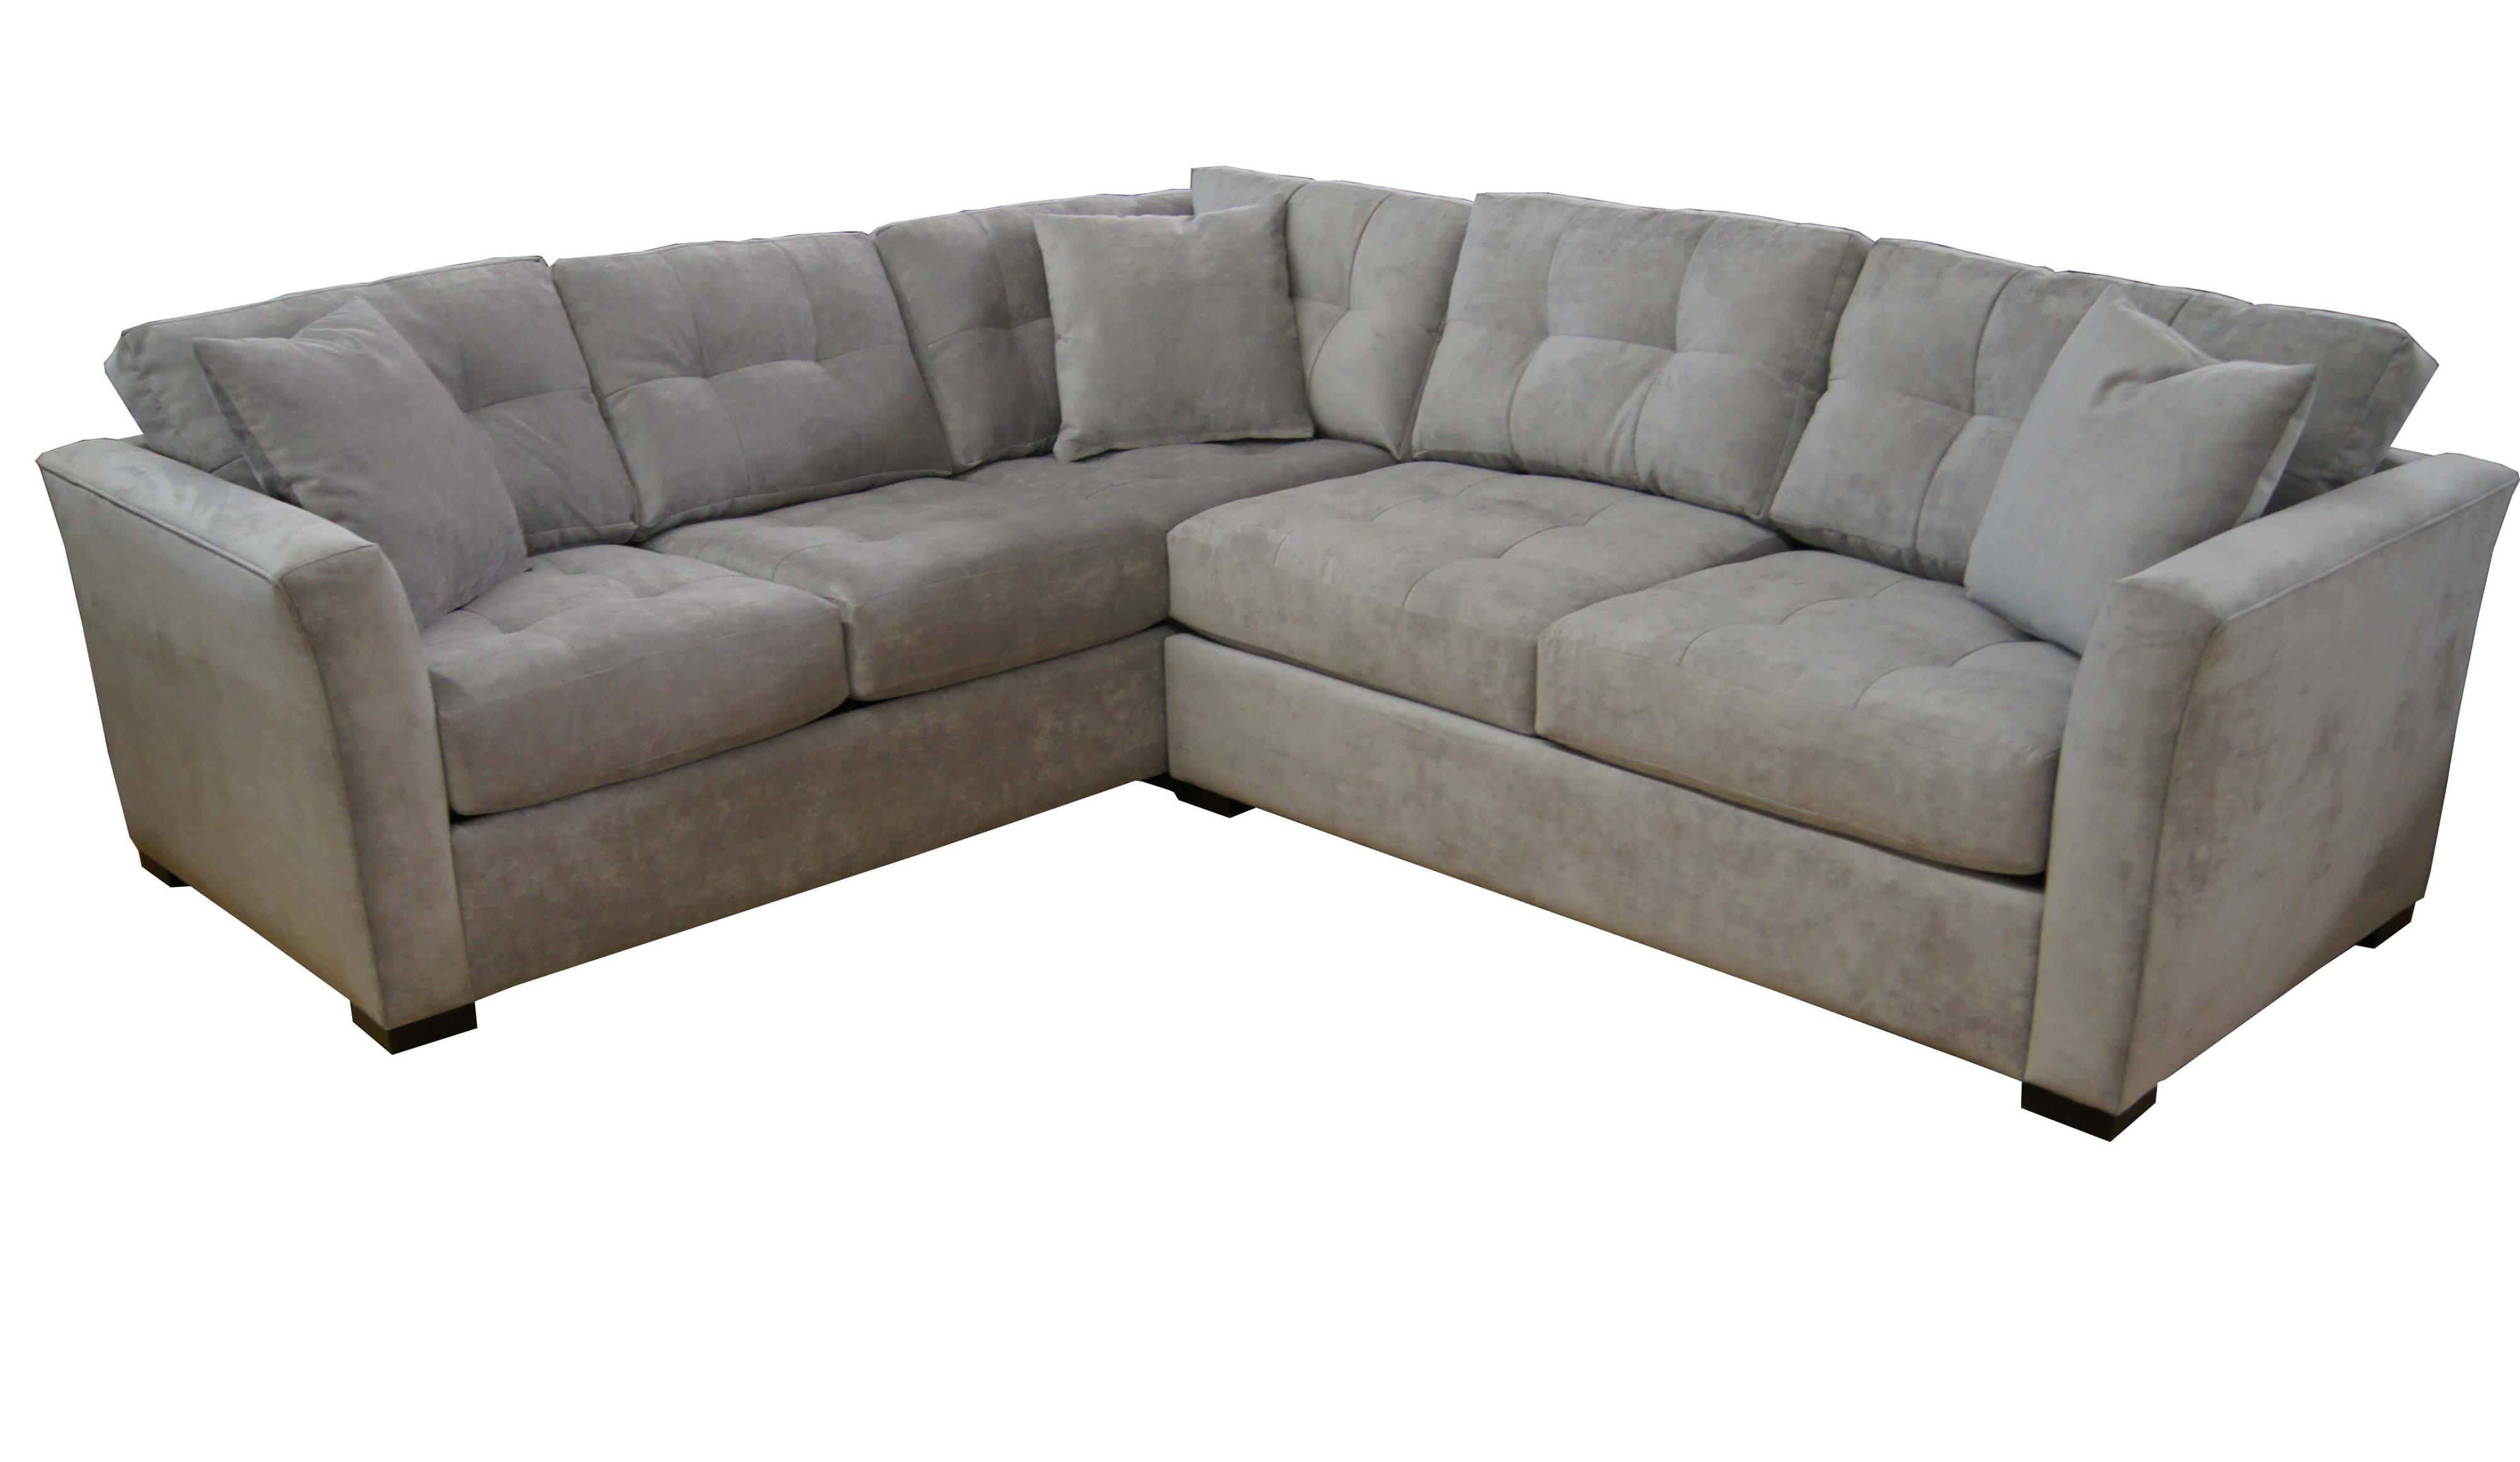 Jonathan Louis Sectional Sofa Three Piece Contemporary 126